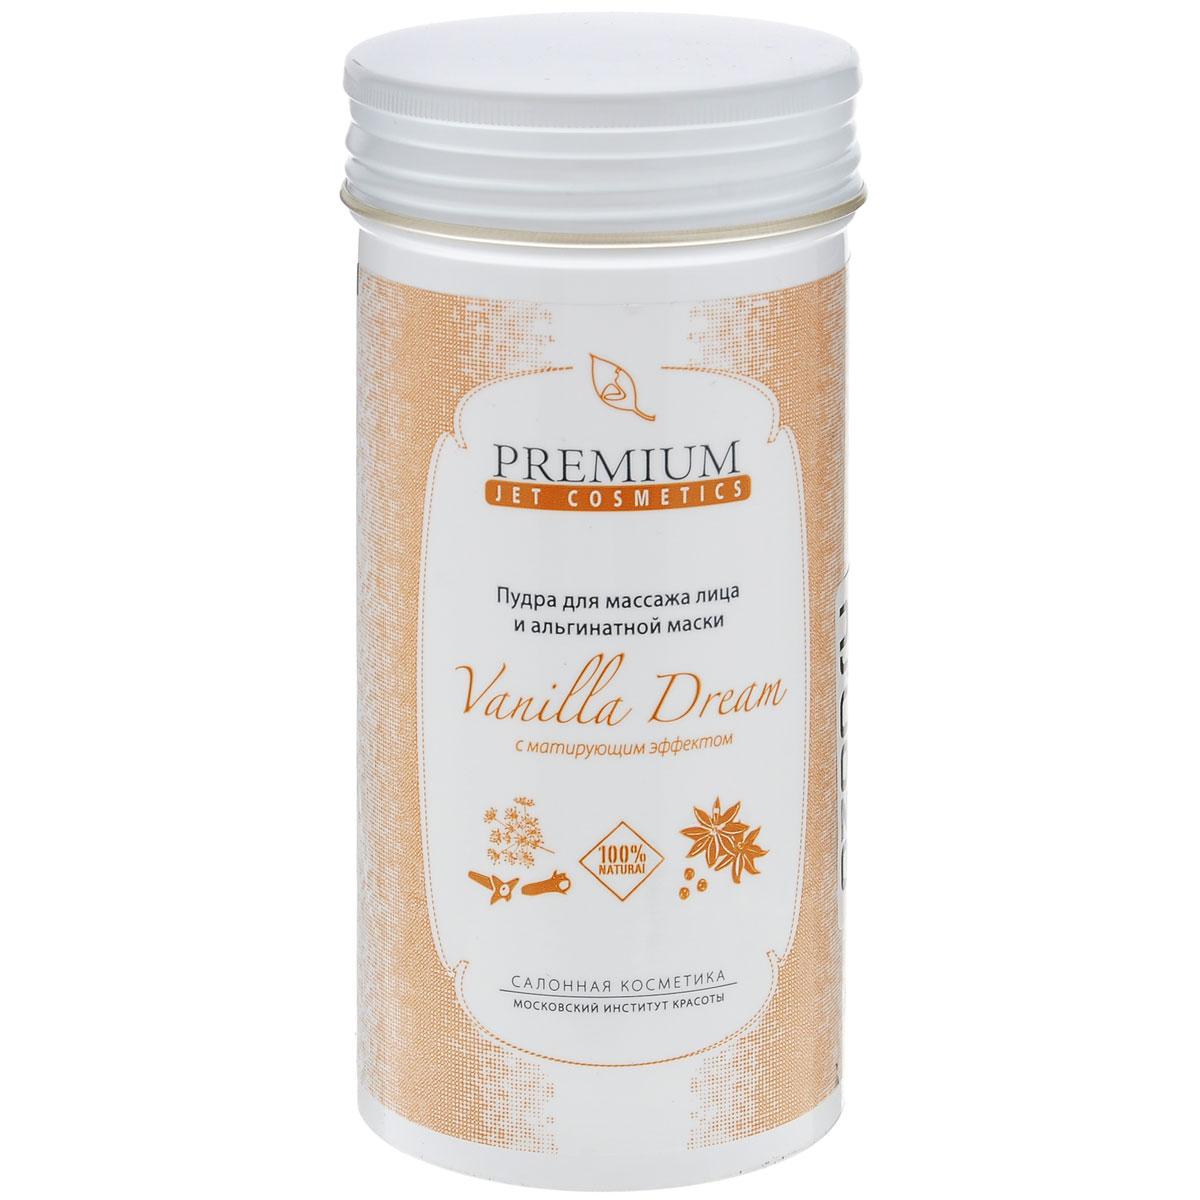 Альгинатная пудра-маска Vanilla dream, 150 гр.ГП060007